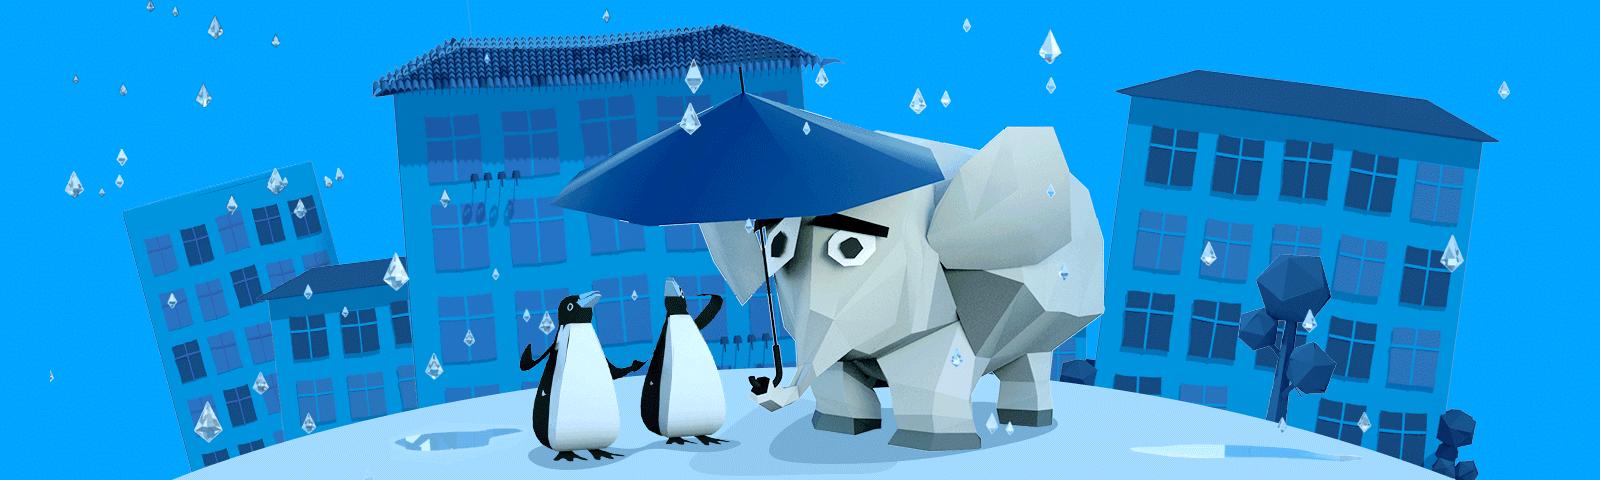 Конкурс снеговиков (завершен)